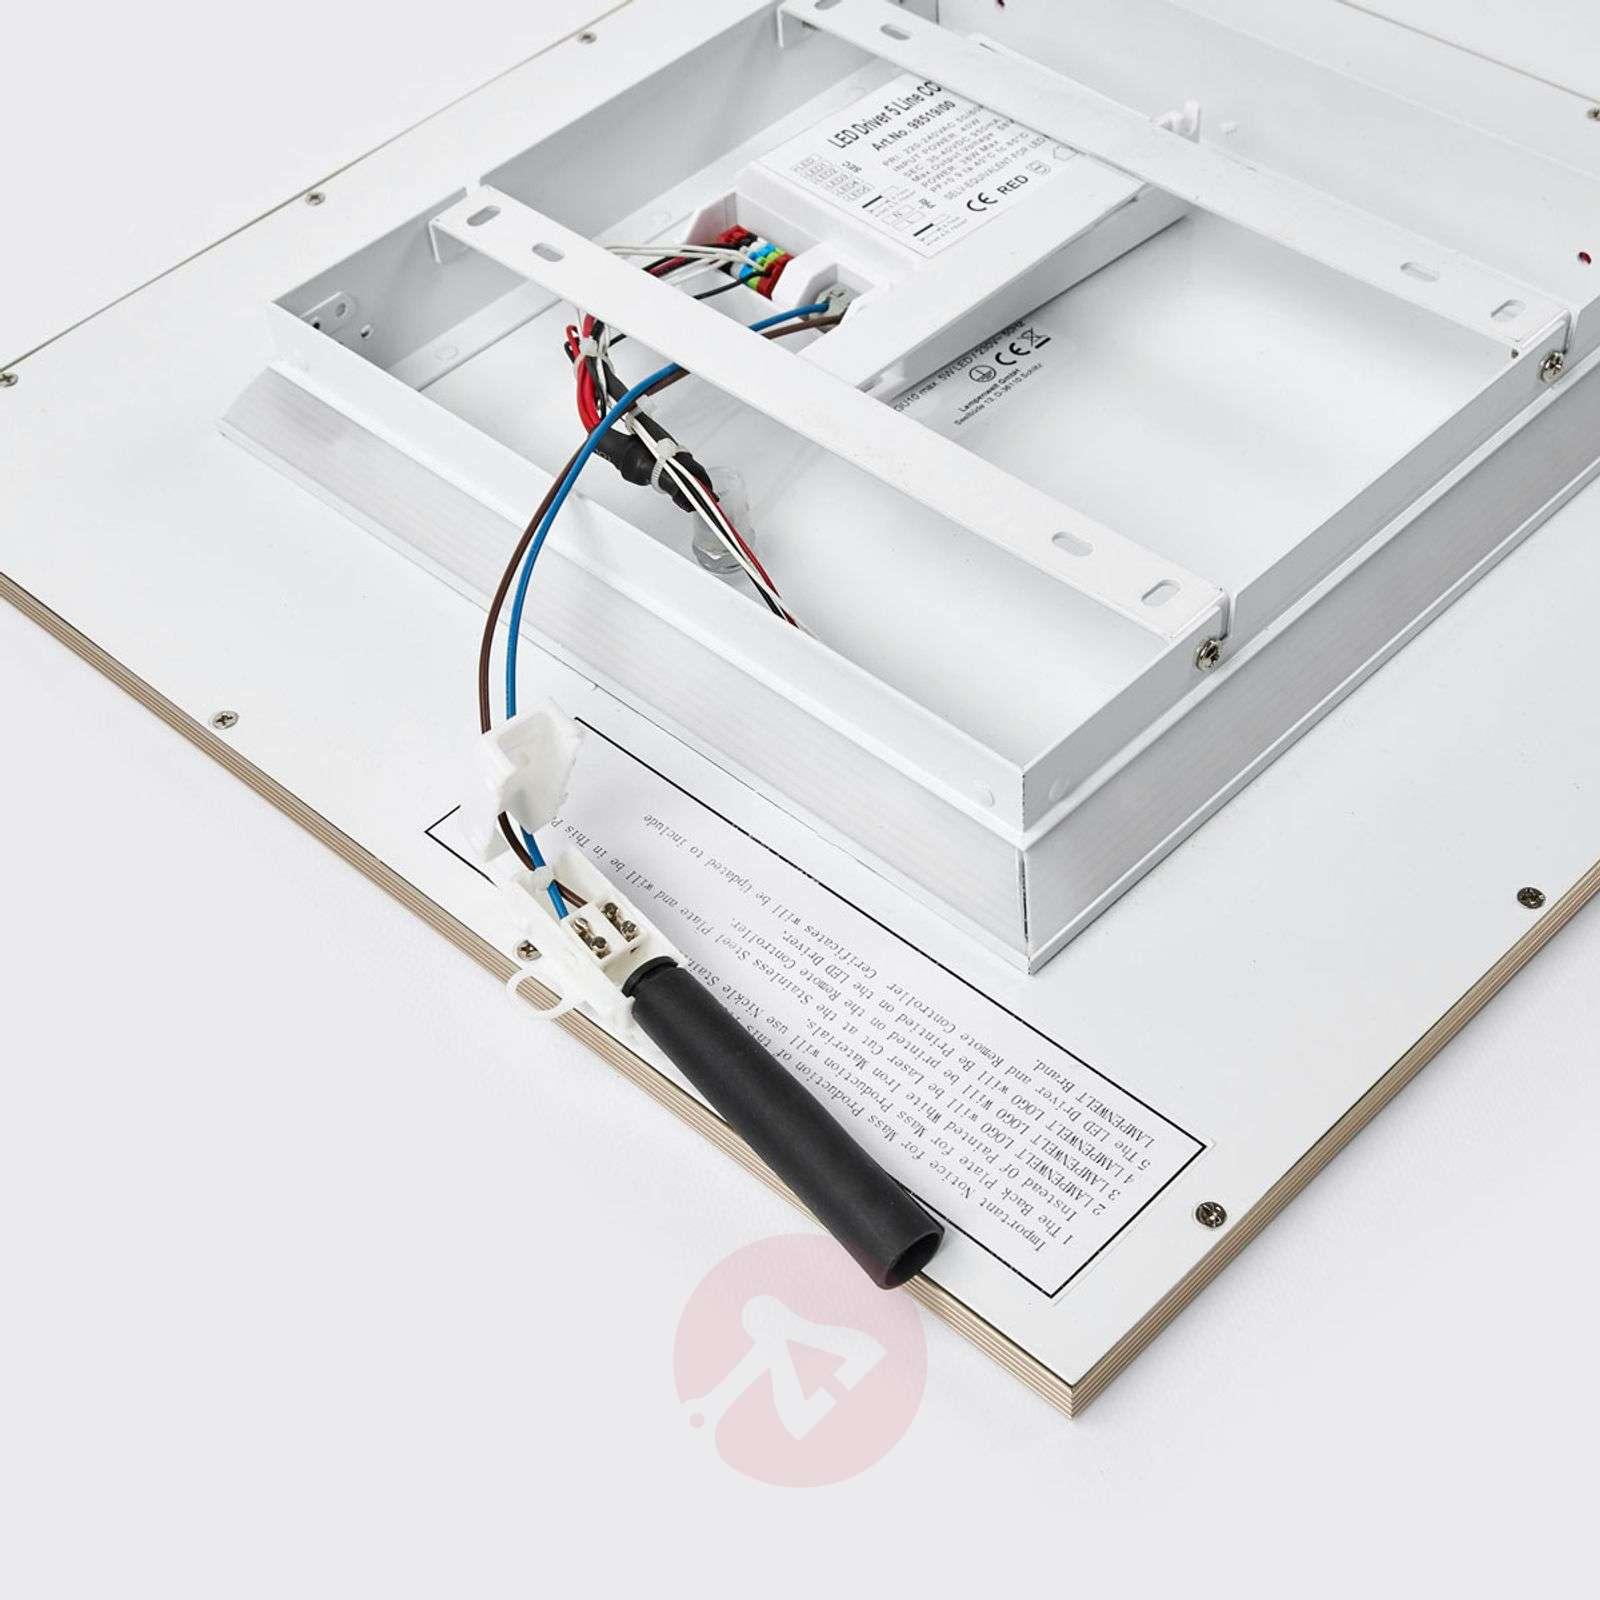 LED-kattovalaisin Corinna, 2700-6200K, 42x42cm-1558120-04